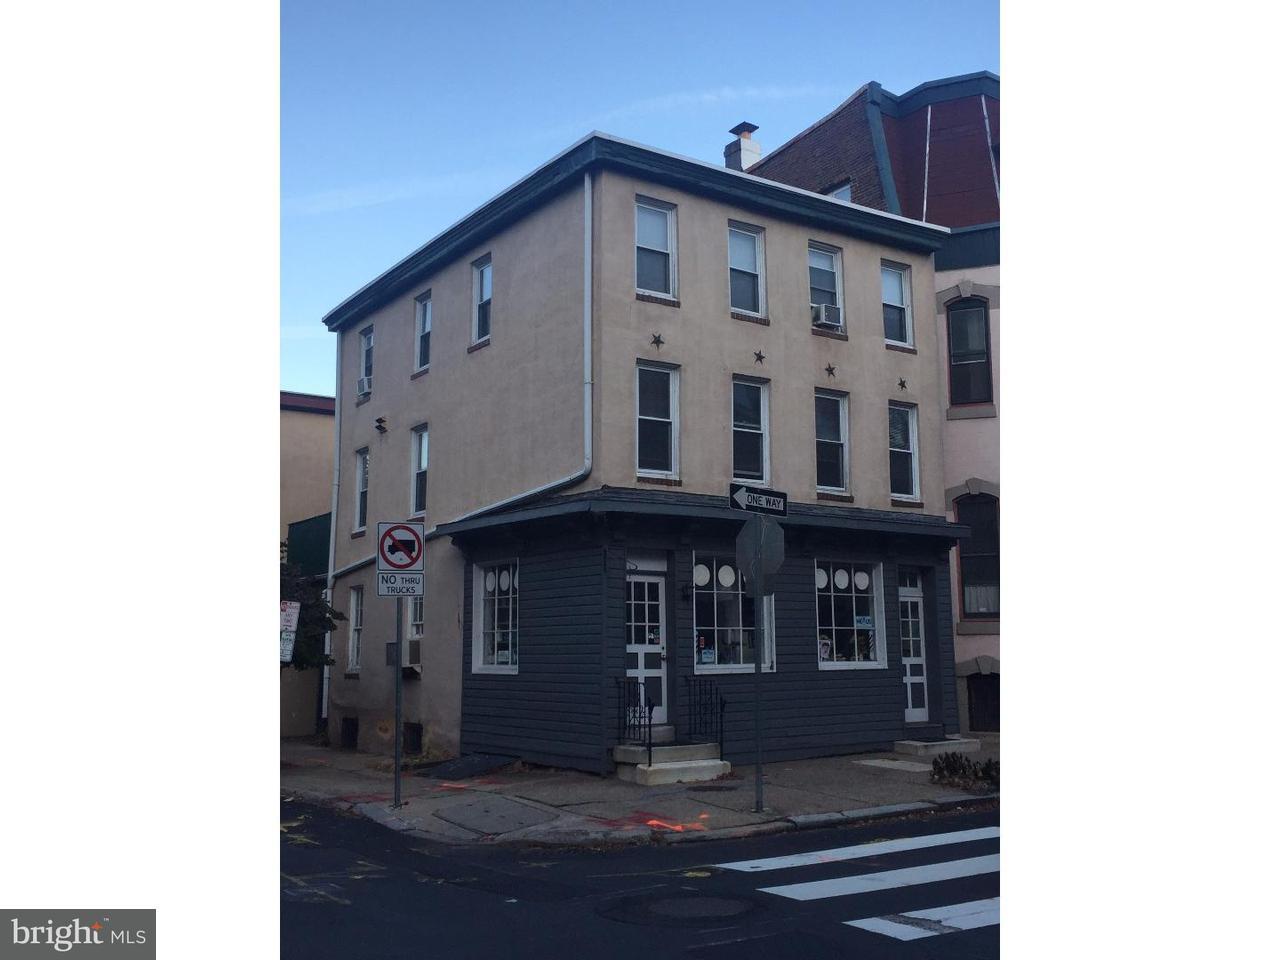 130 N 21ST Philadelphia, PA 19103